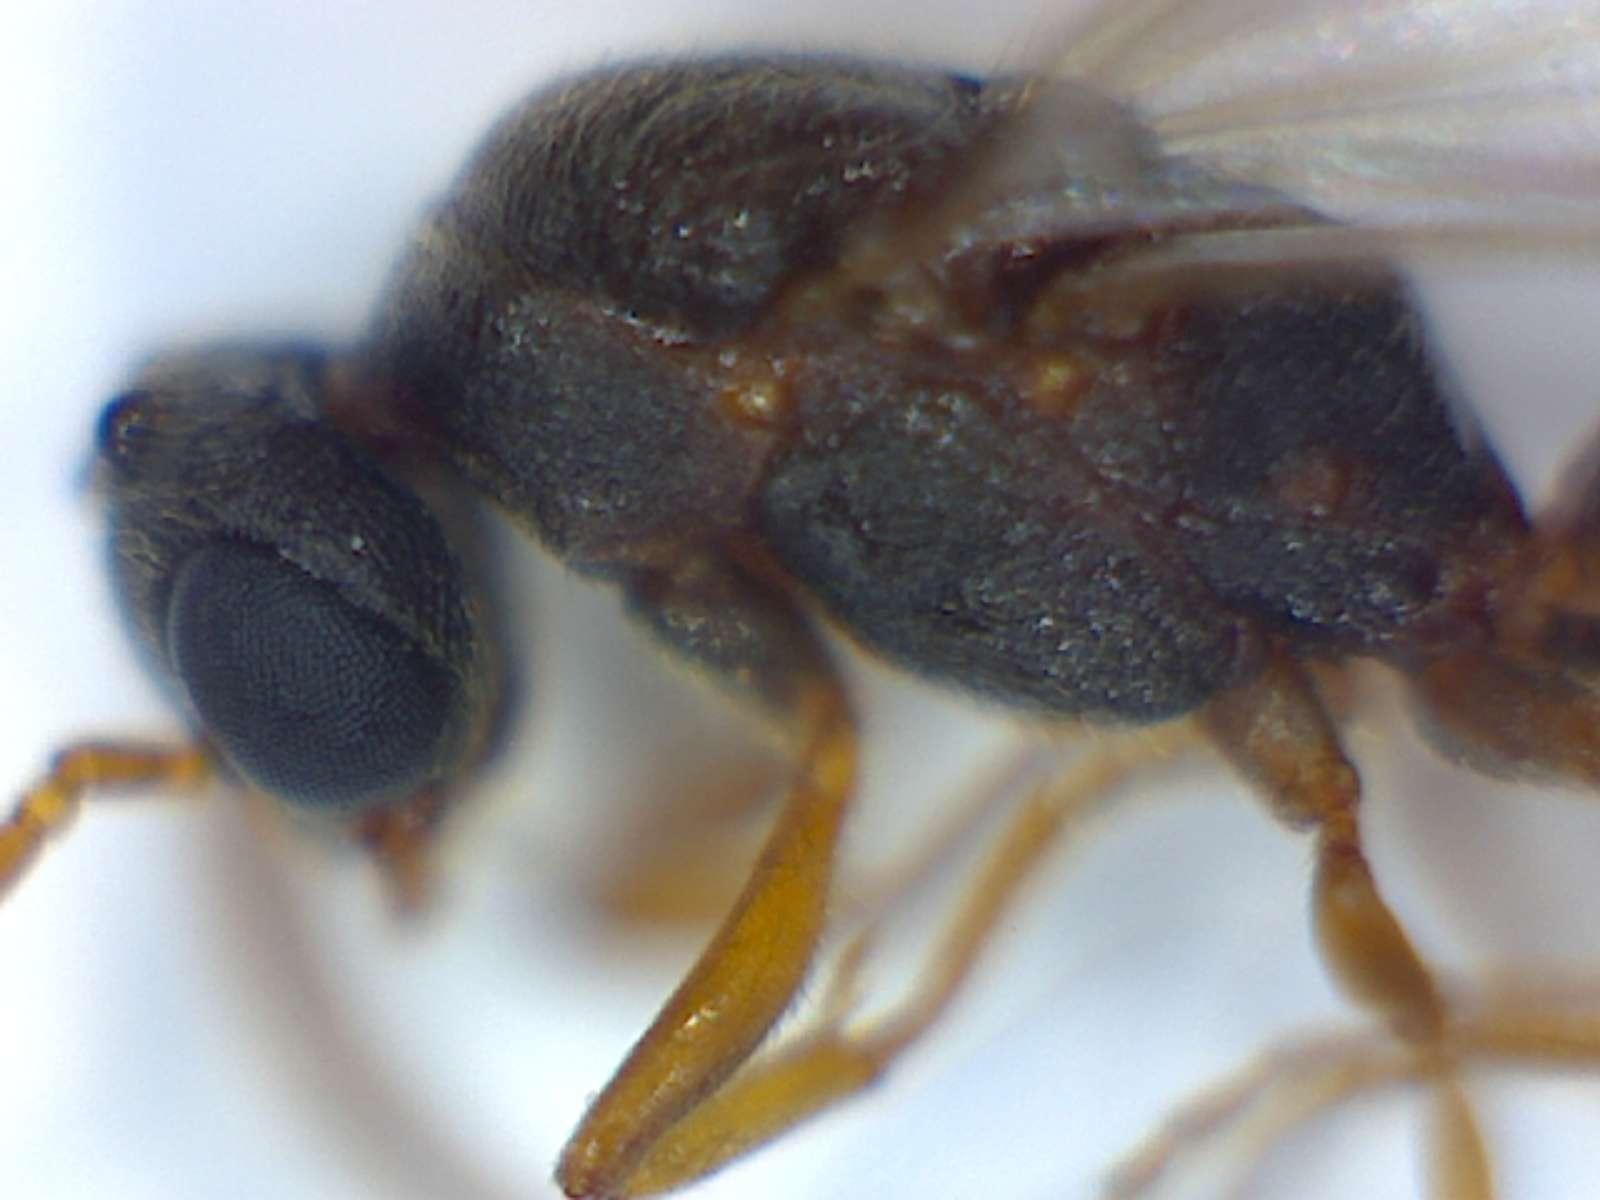 Male Amblyopone ant